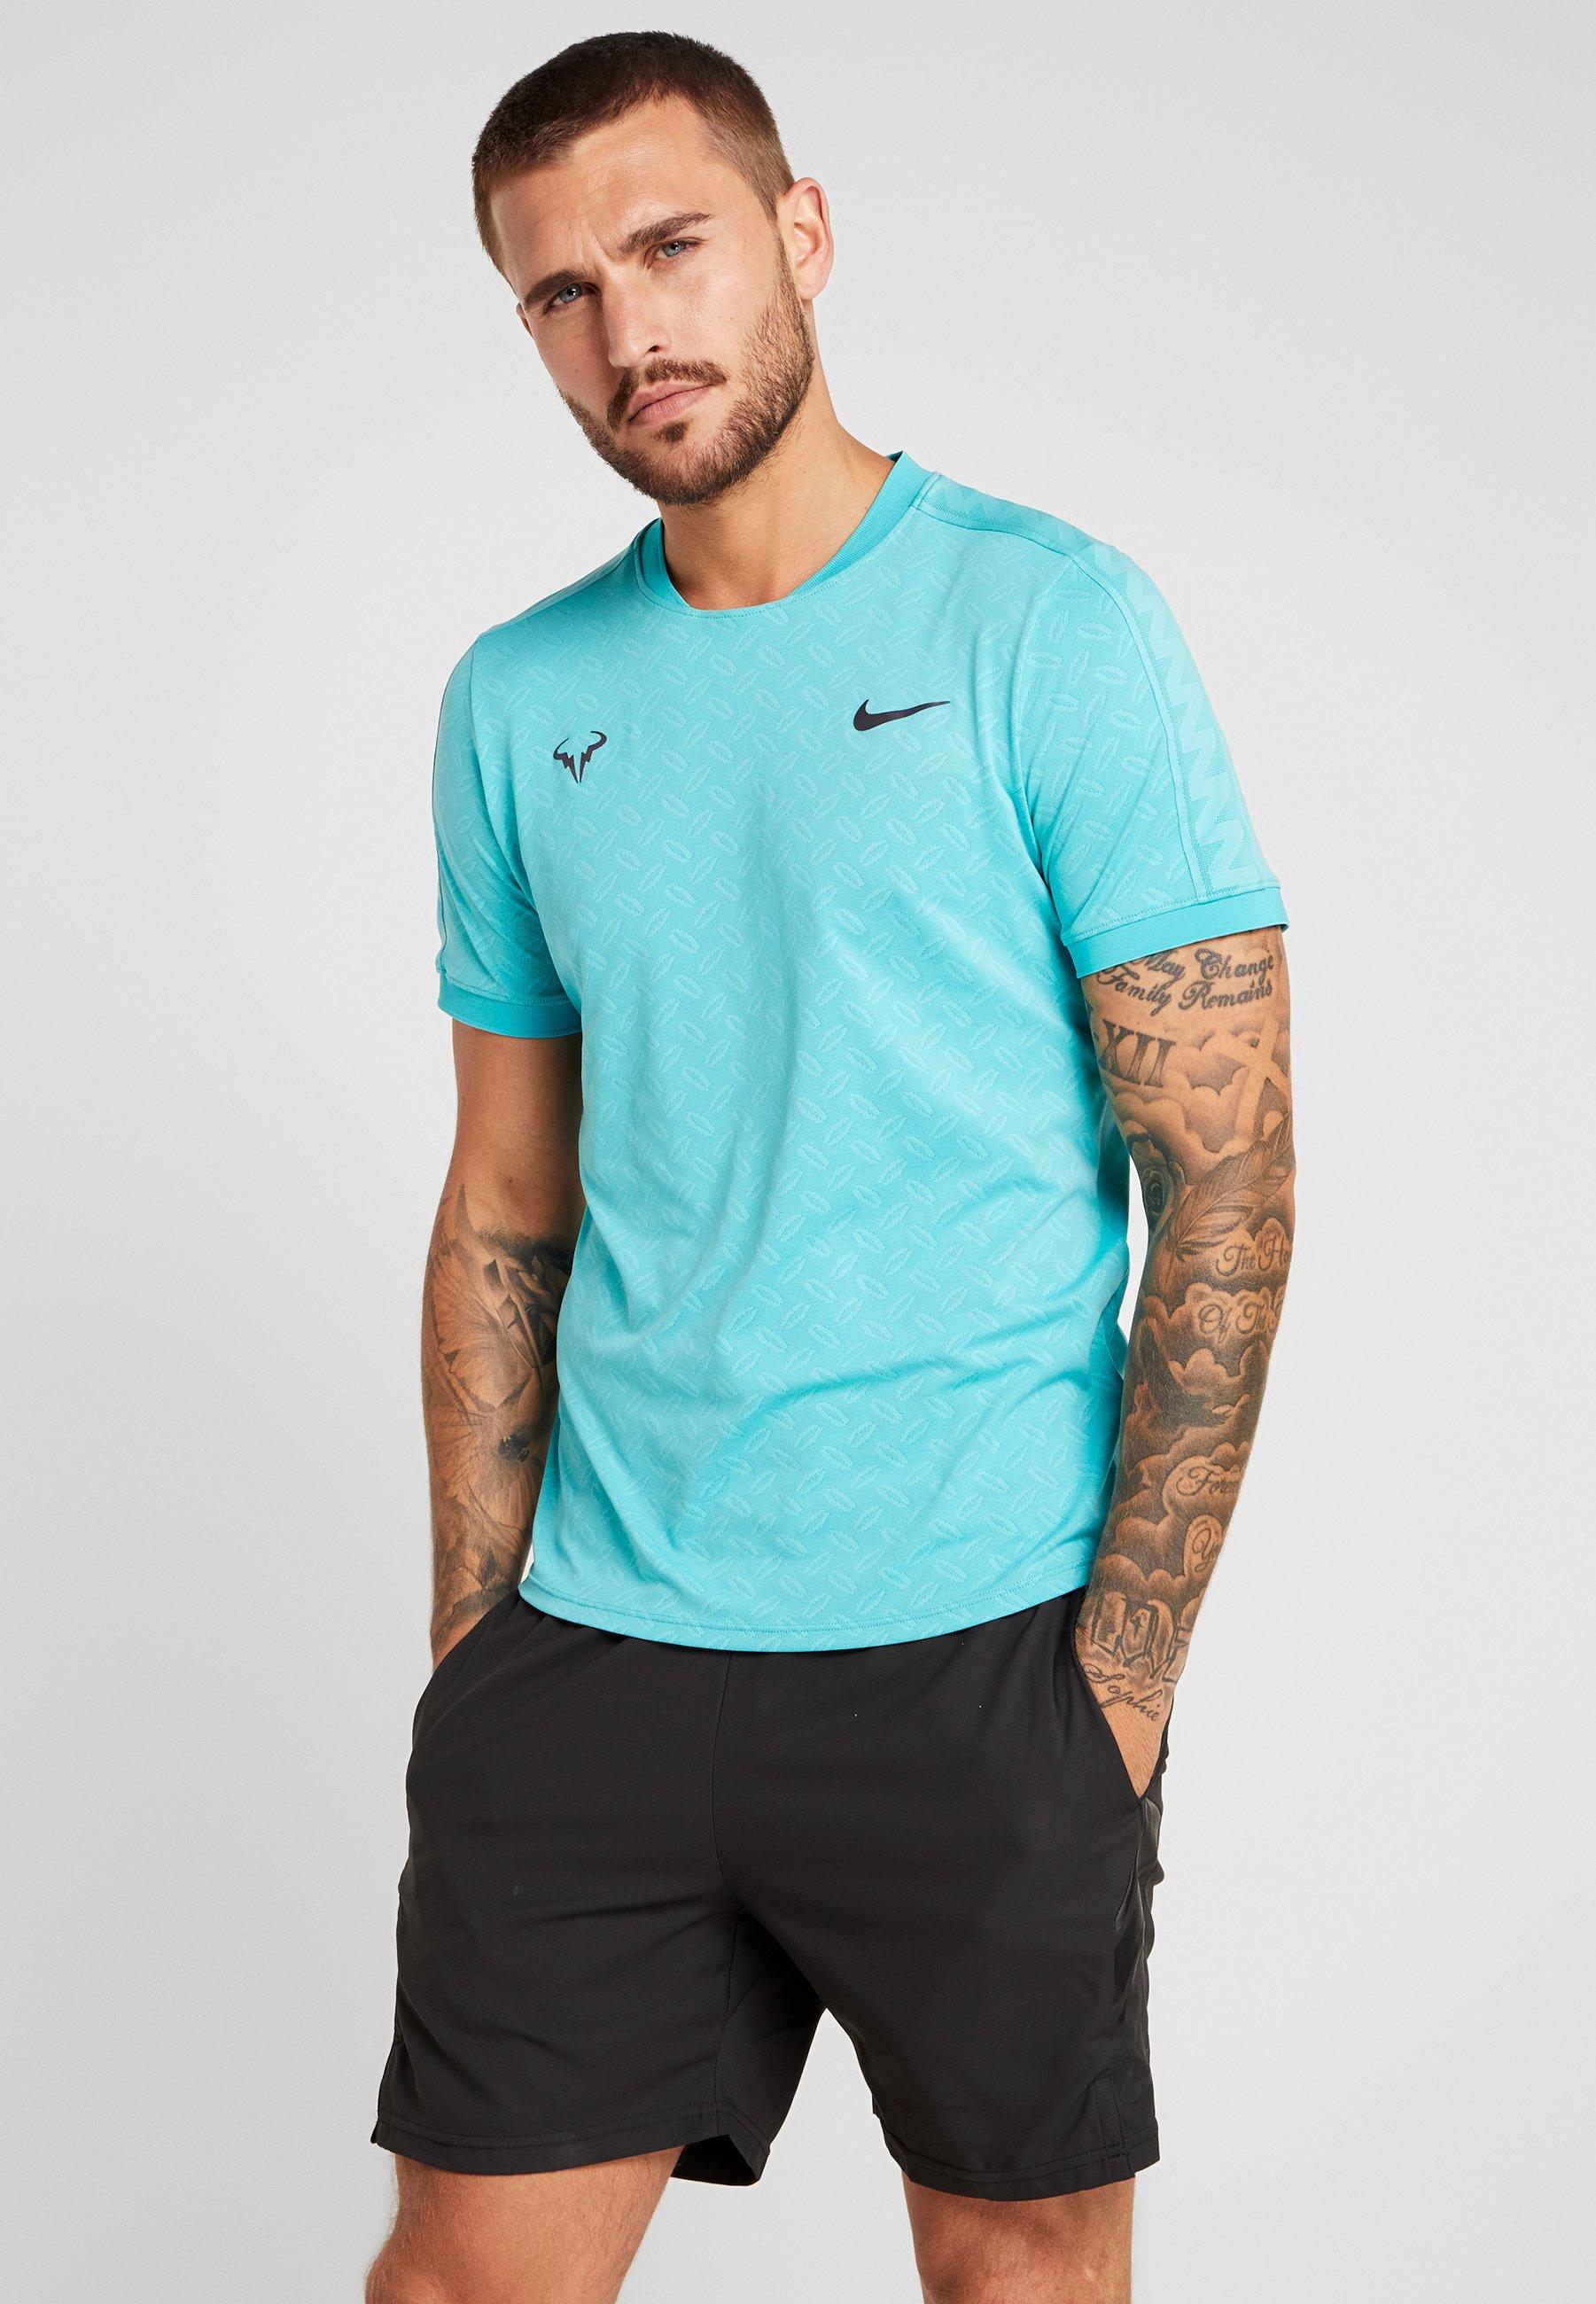 Nike Rafael gridiron Imprimé Hyper shirt Performance NadalT Jade dtrshQC